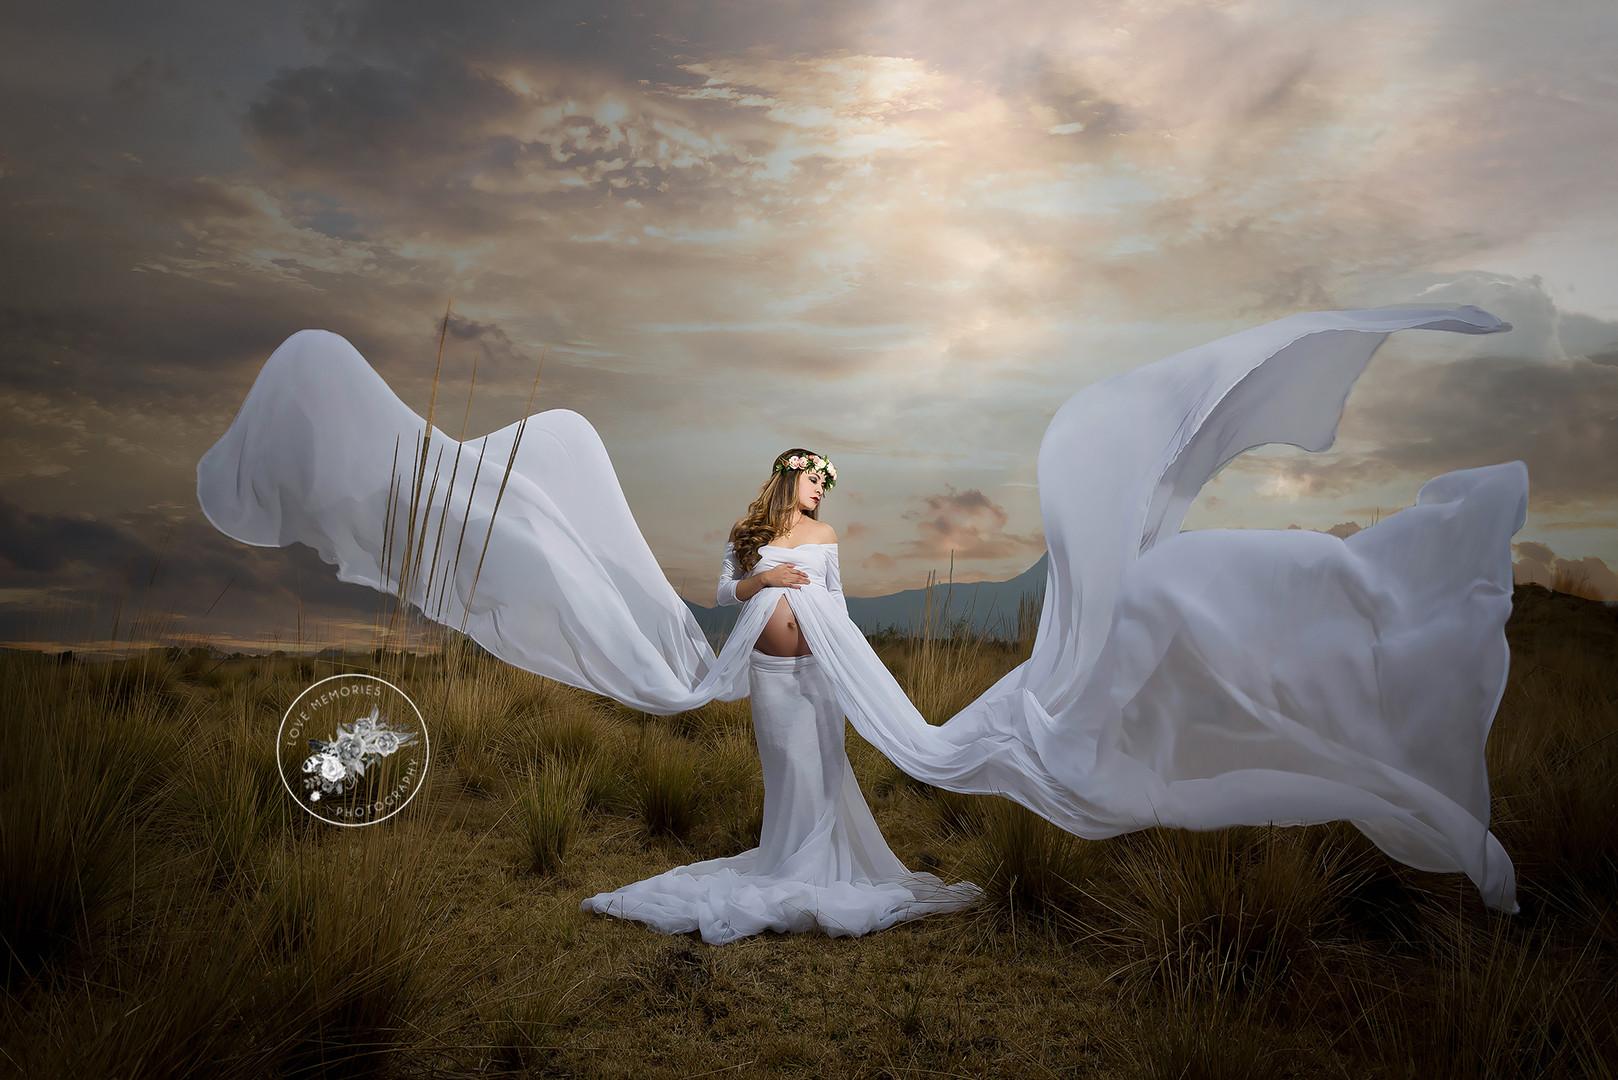 fotografo de maternidad embarazo toluca metepec pregnancy